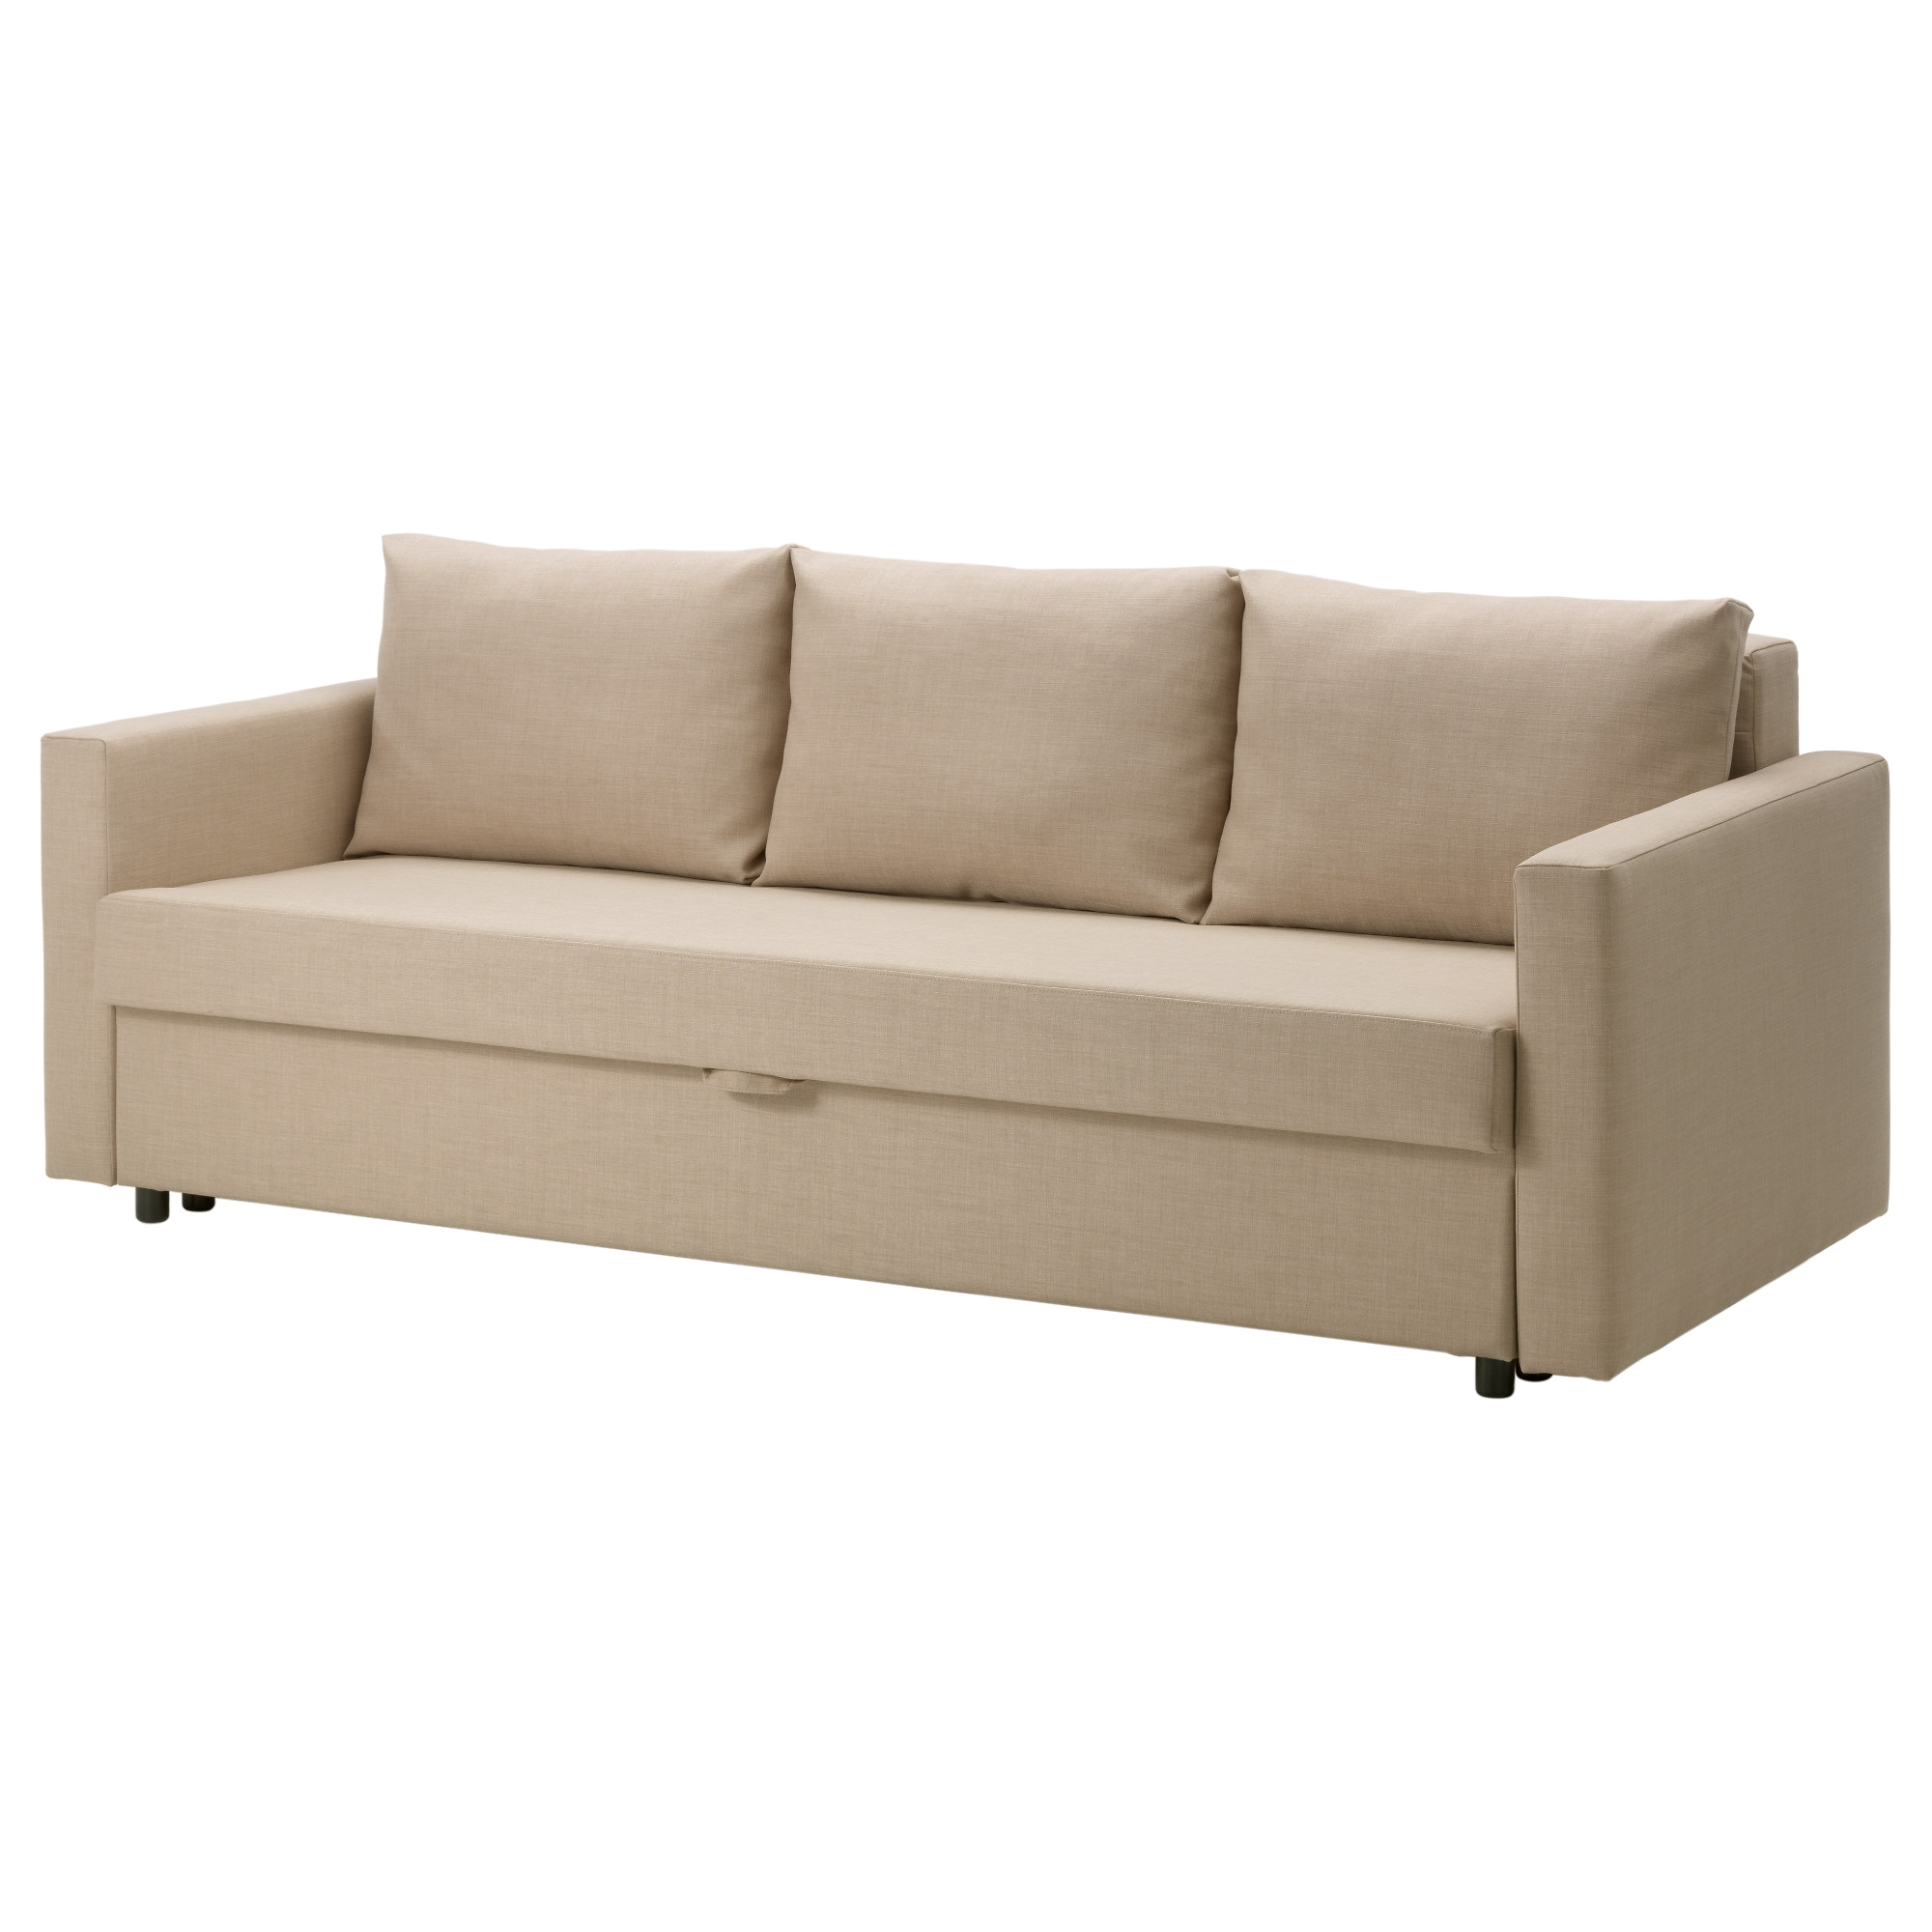 Bobs Furniture Futon 20 Luxury Bobs sofa Bed Anissa sofa Gallery